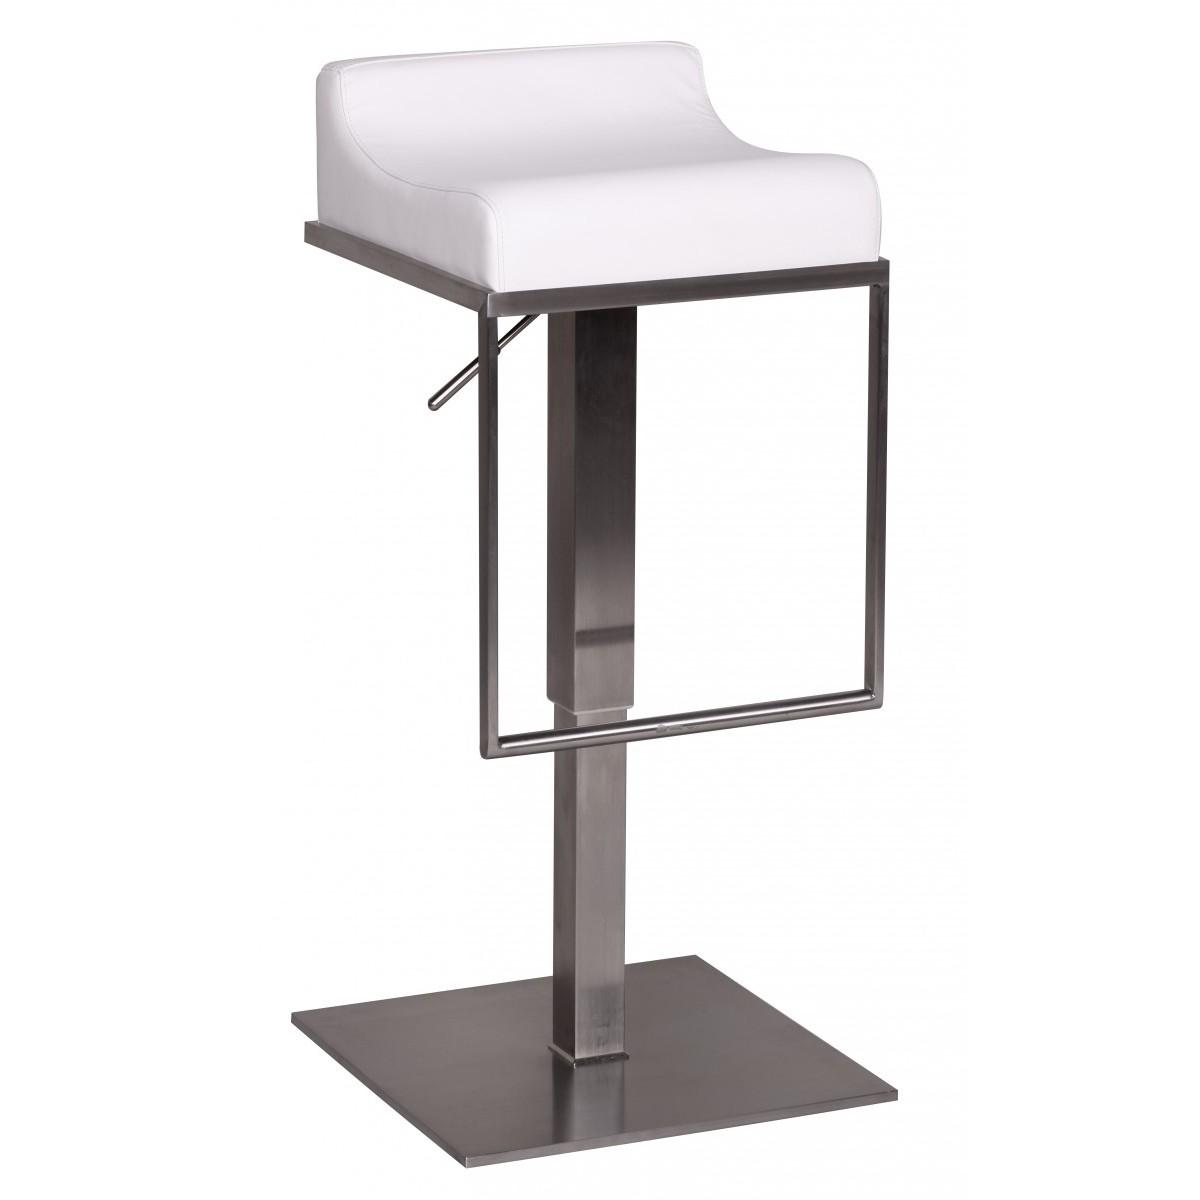 barhocker wei edelstahl barstuhl farbe silbern wei. Black Bedroom Furniture Sets. Home Design Ideas